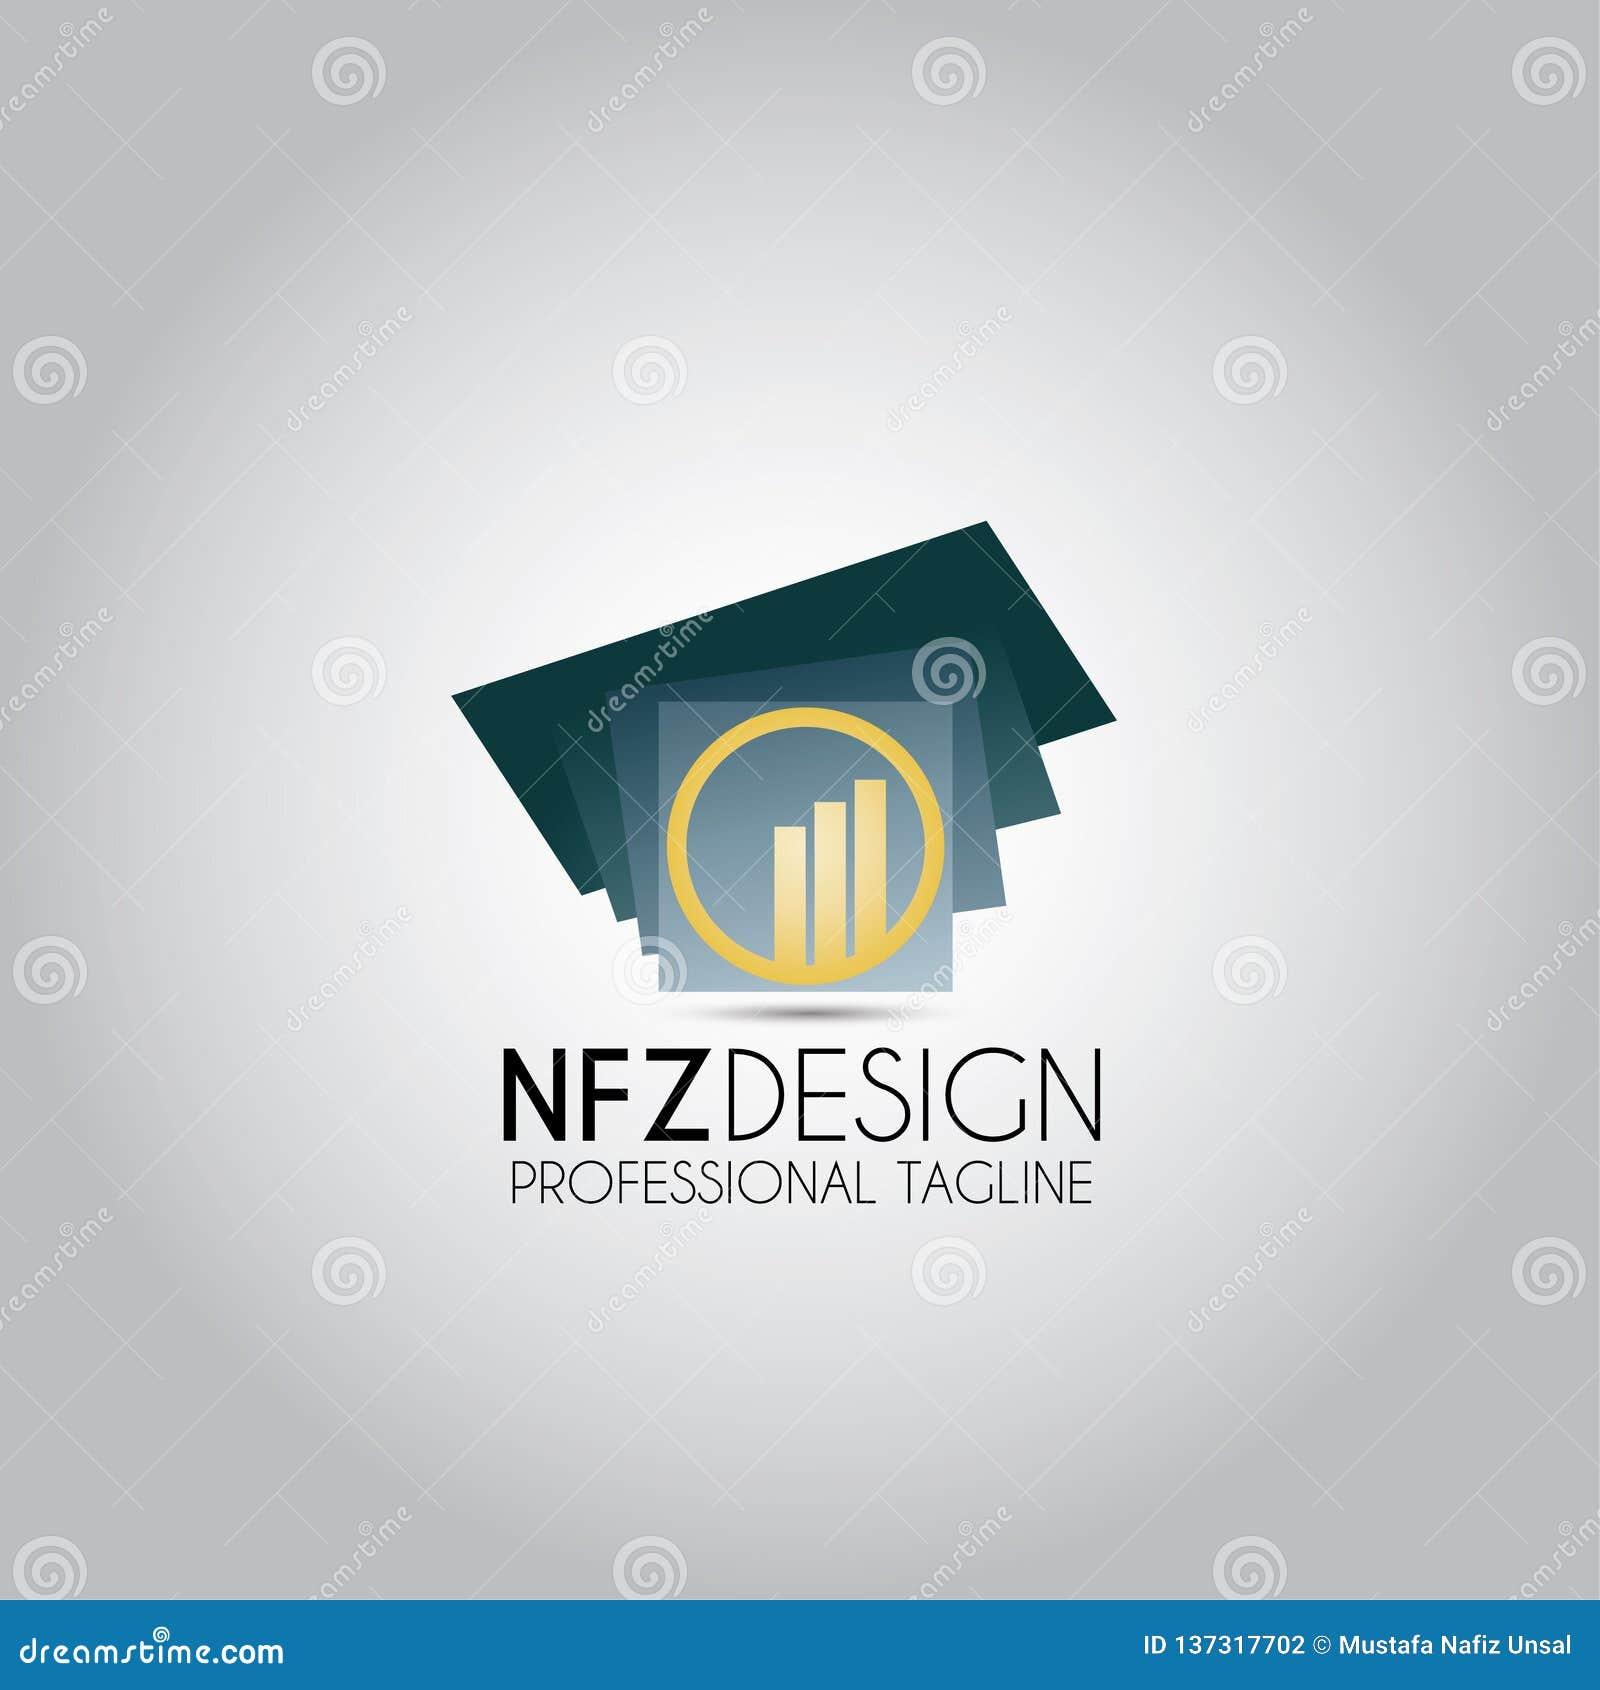 Build Circular Template Logo